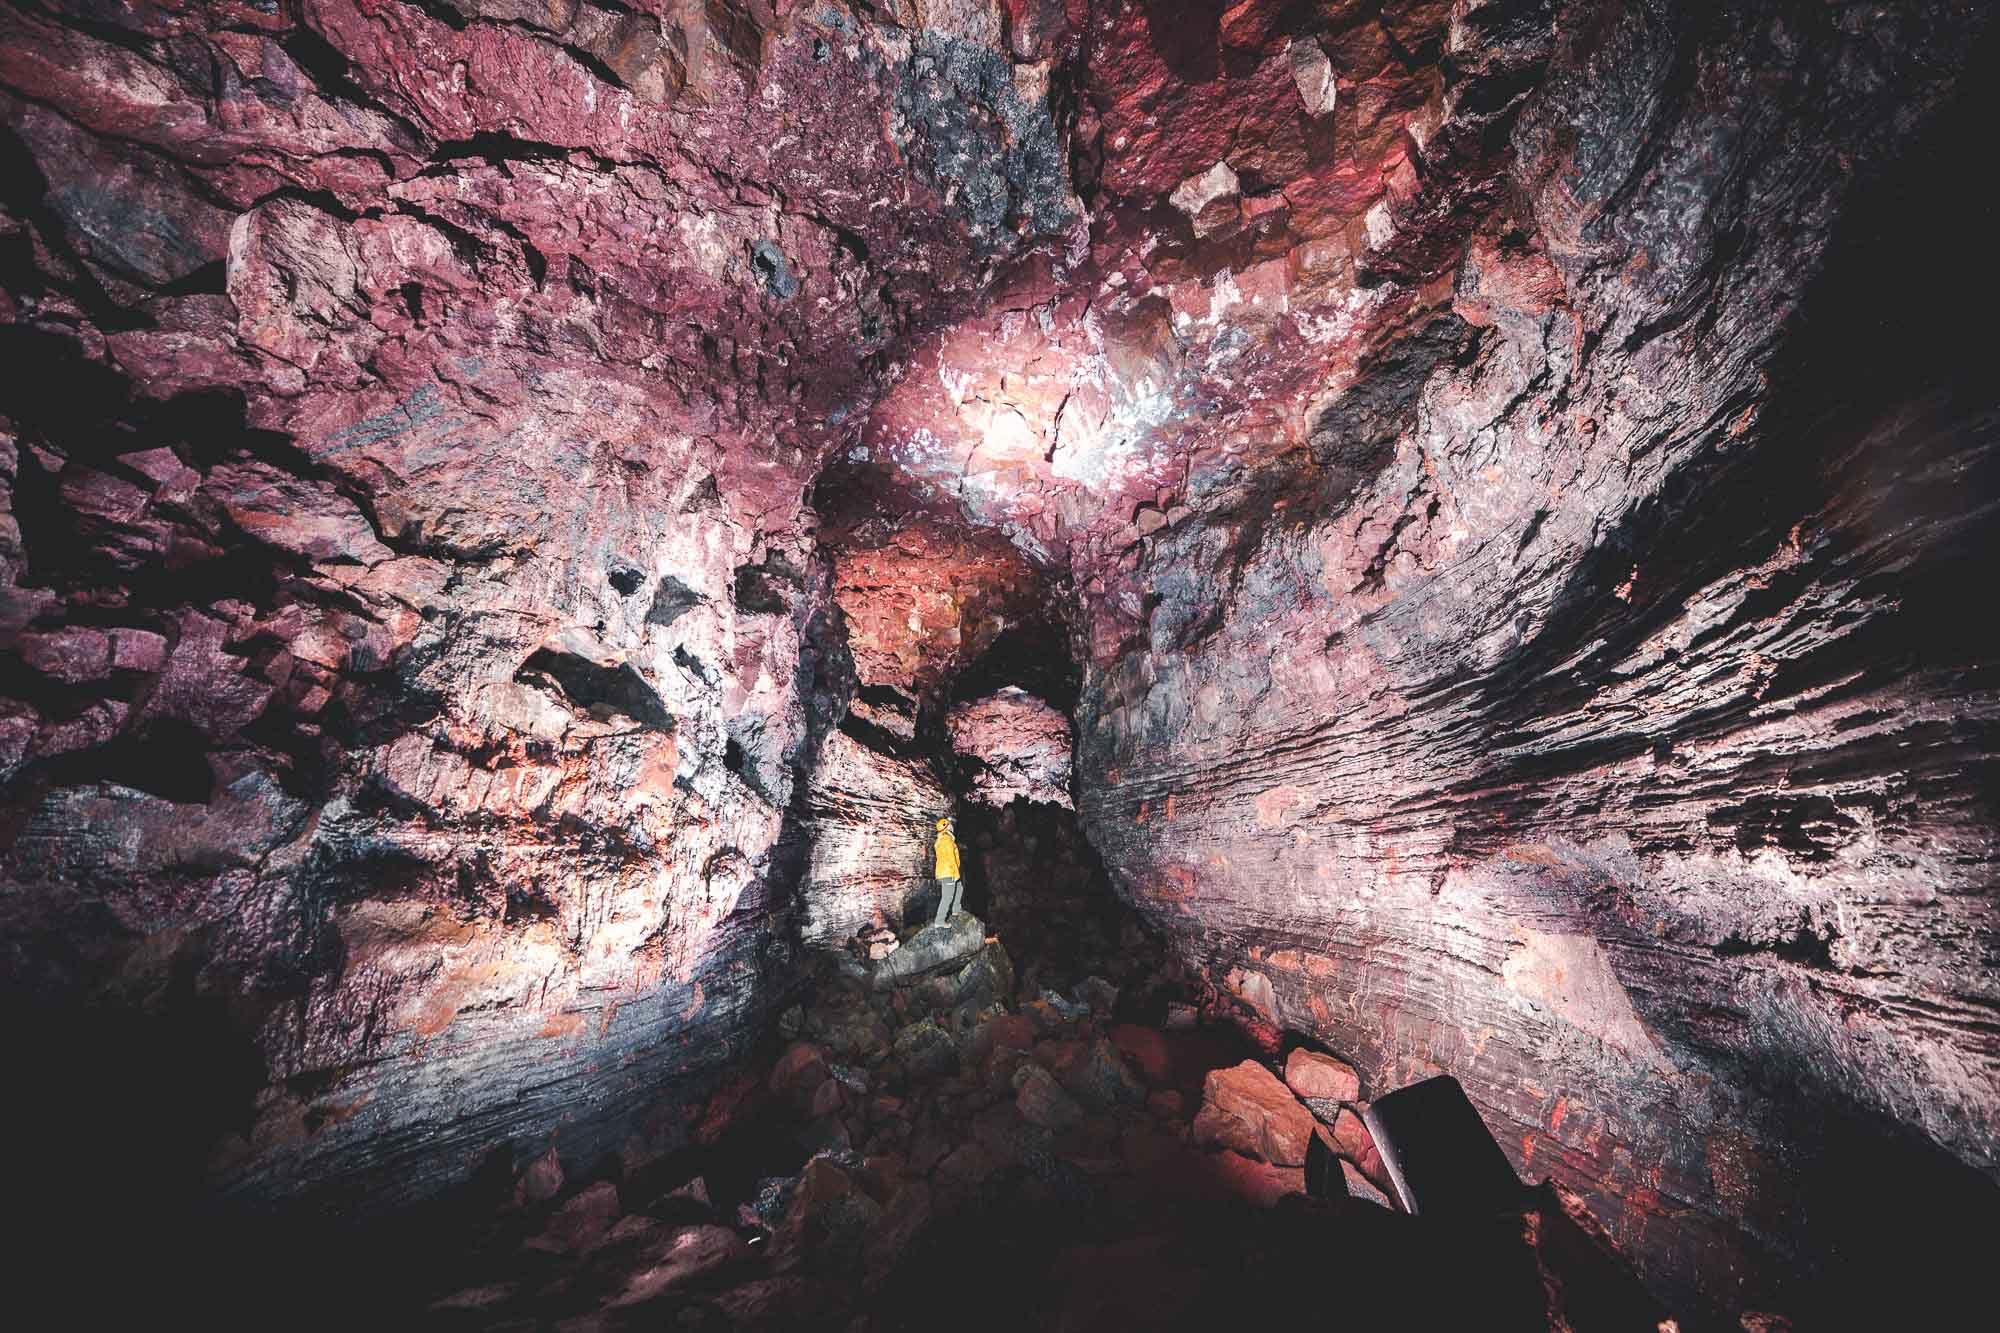 Raufarhólshellir Lava cave, locate don the Reykjanes Peninsula, South-West Iceland.